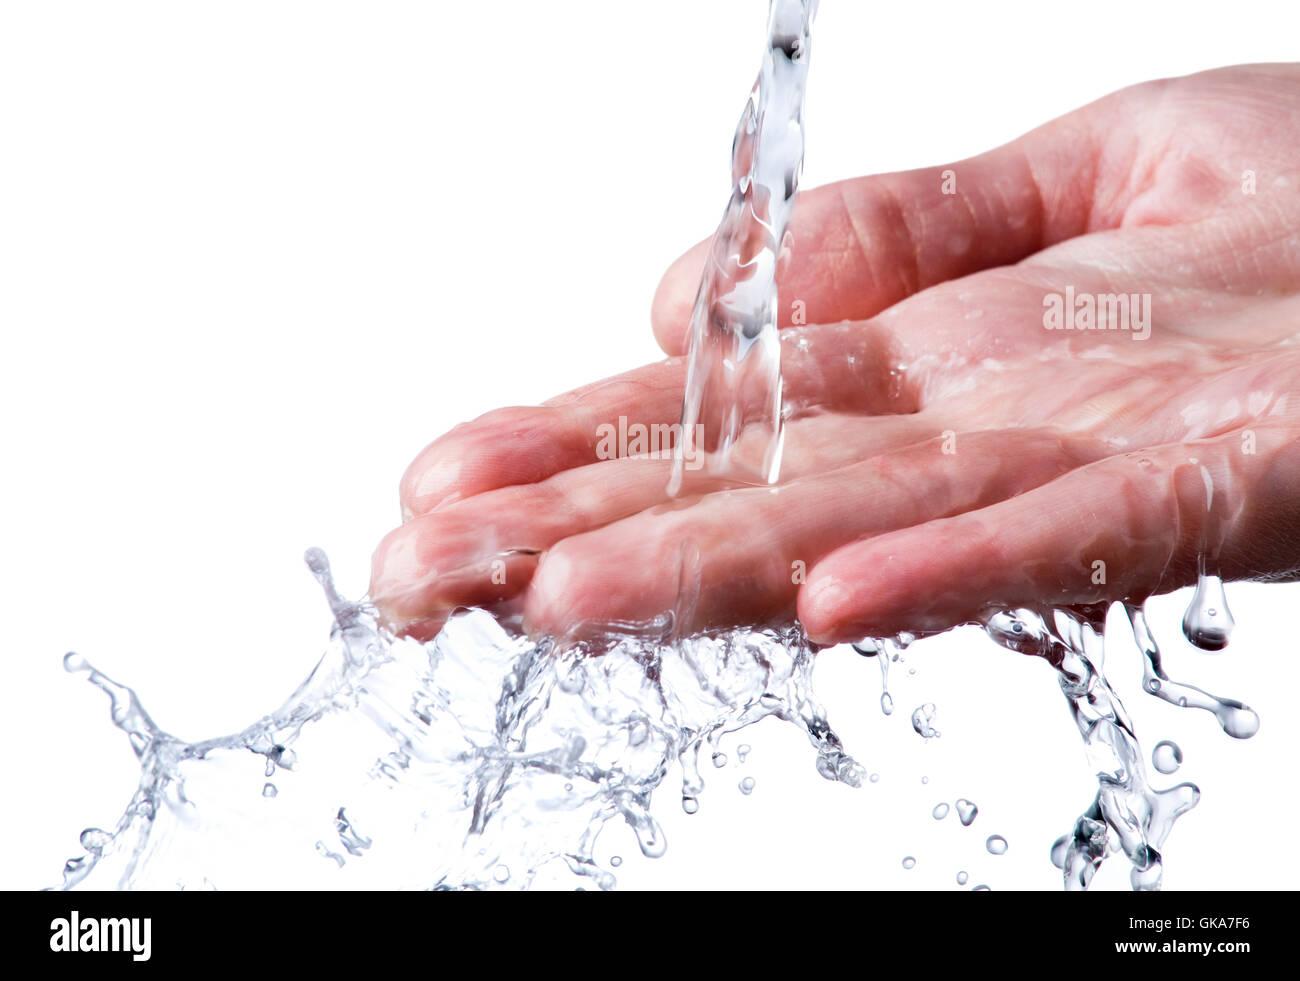 hand wash wet - Stock Image